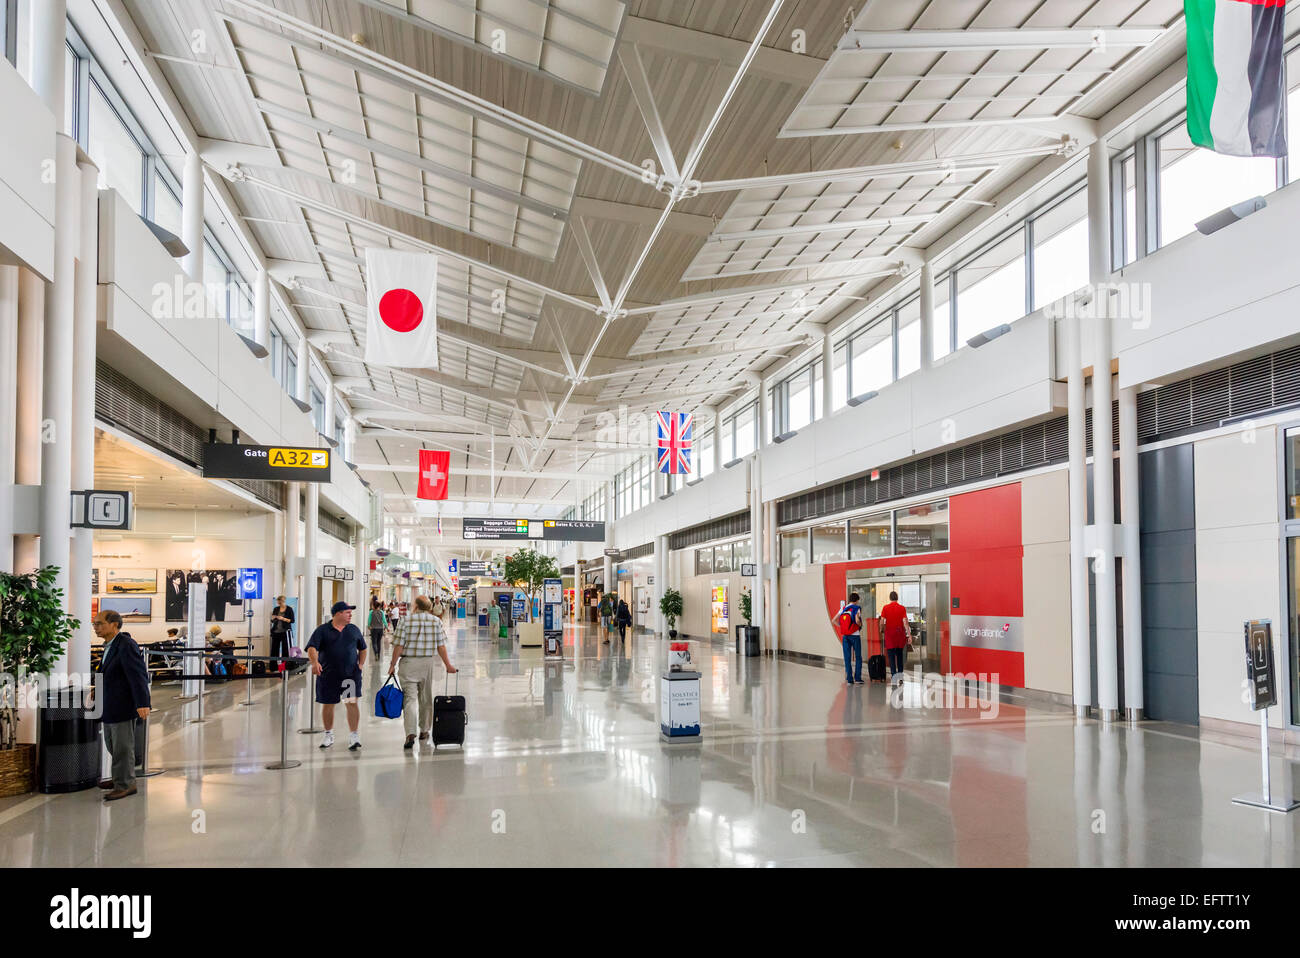 Departure gates at Washington-Dulles International Airport, Dulles, Virginia, USA - Stock Image